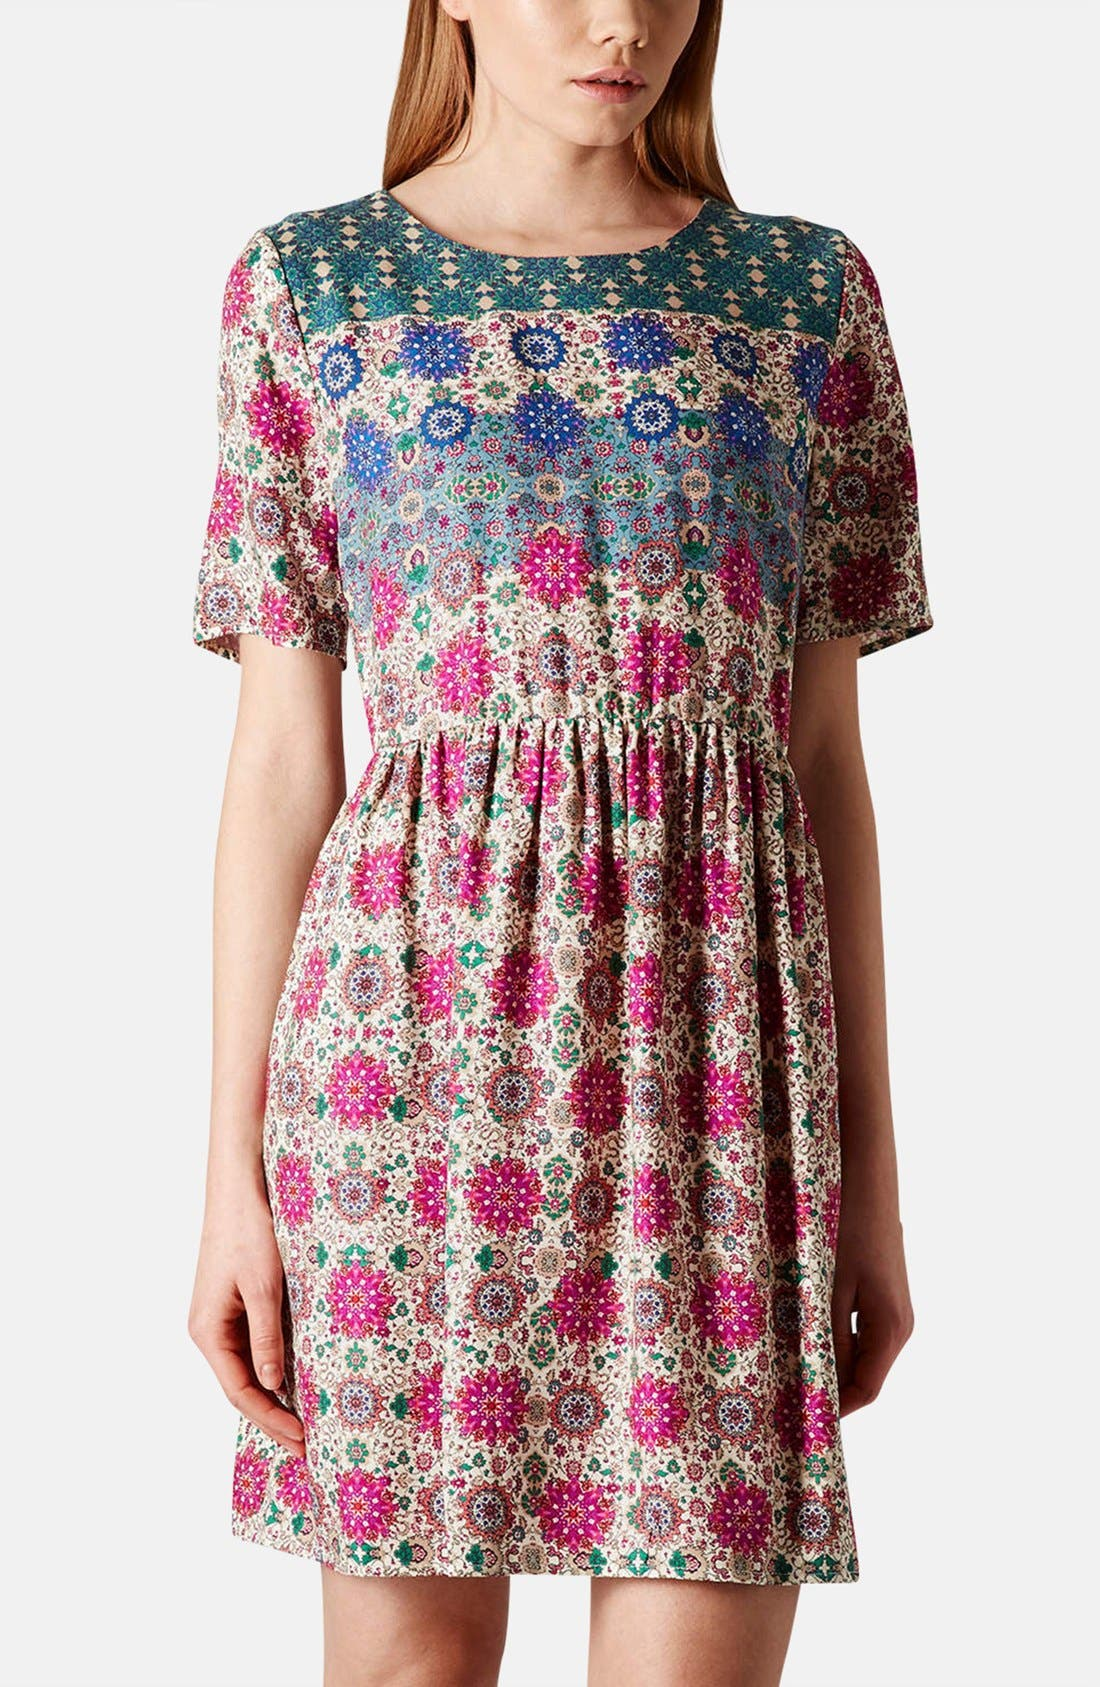 Alternate Image 1 Selected - Topshop 'Folk Border' Print Day Dress